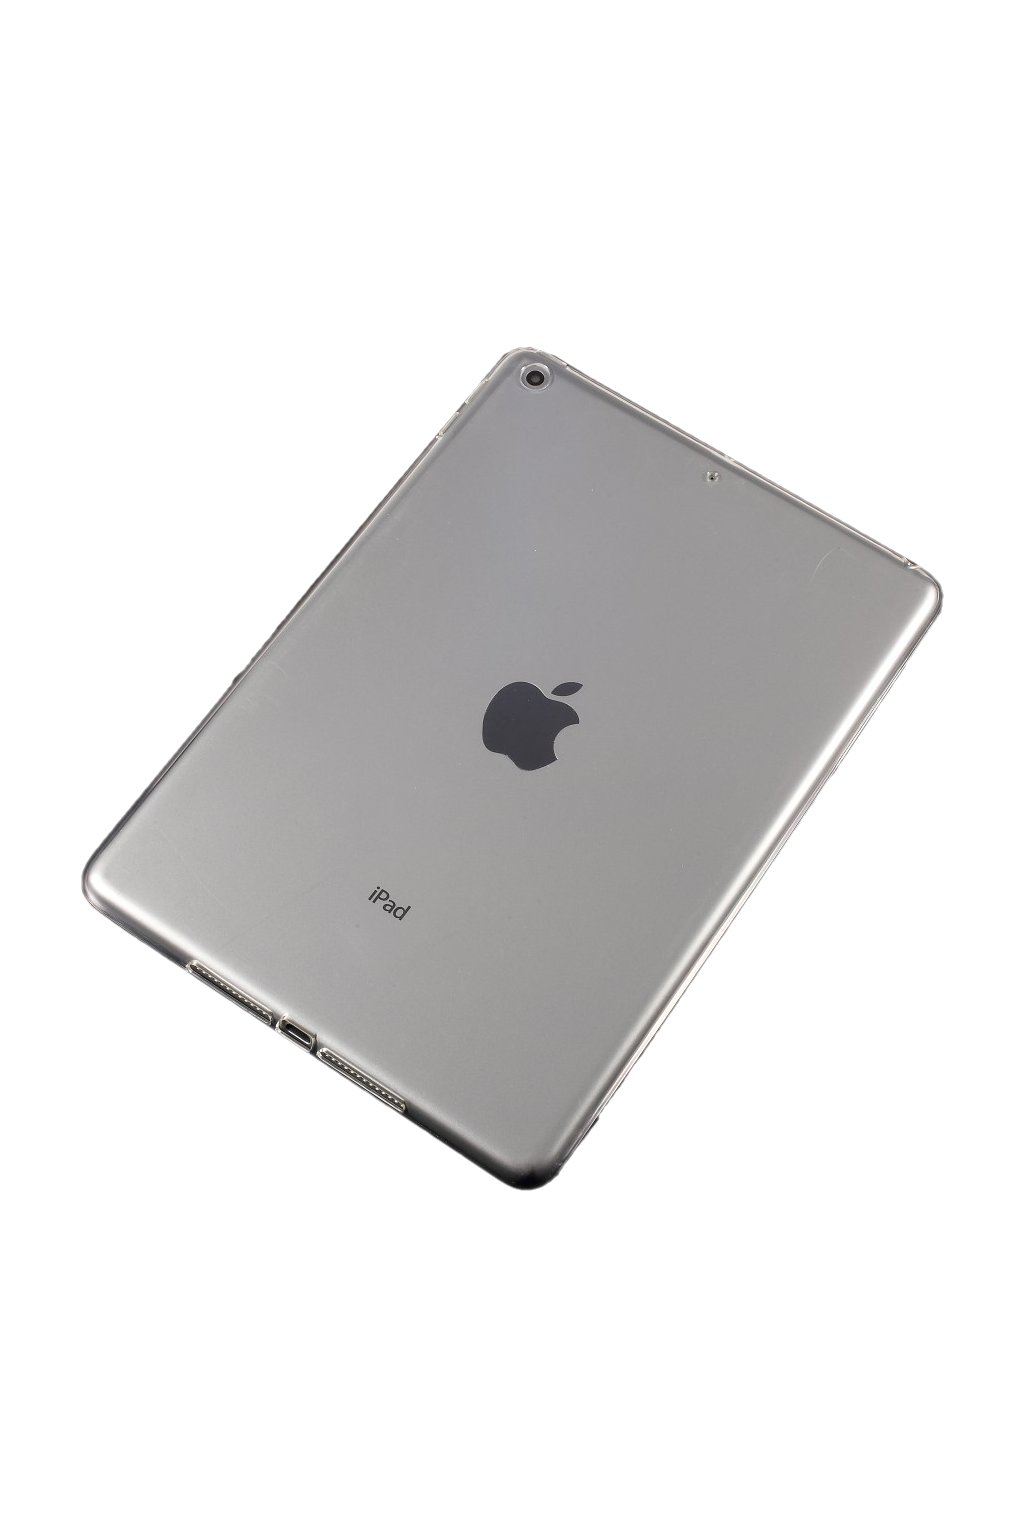 "Silikonový kryt (TPU) pro Apple iPad Air/9,7"" (17/18), transparentní"